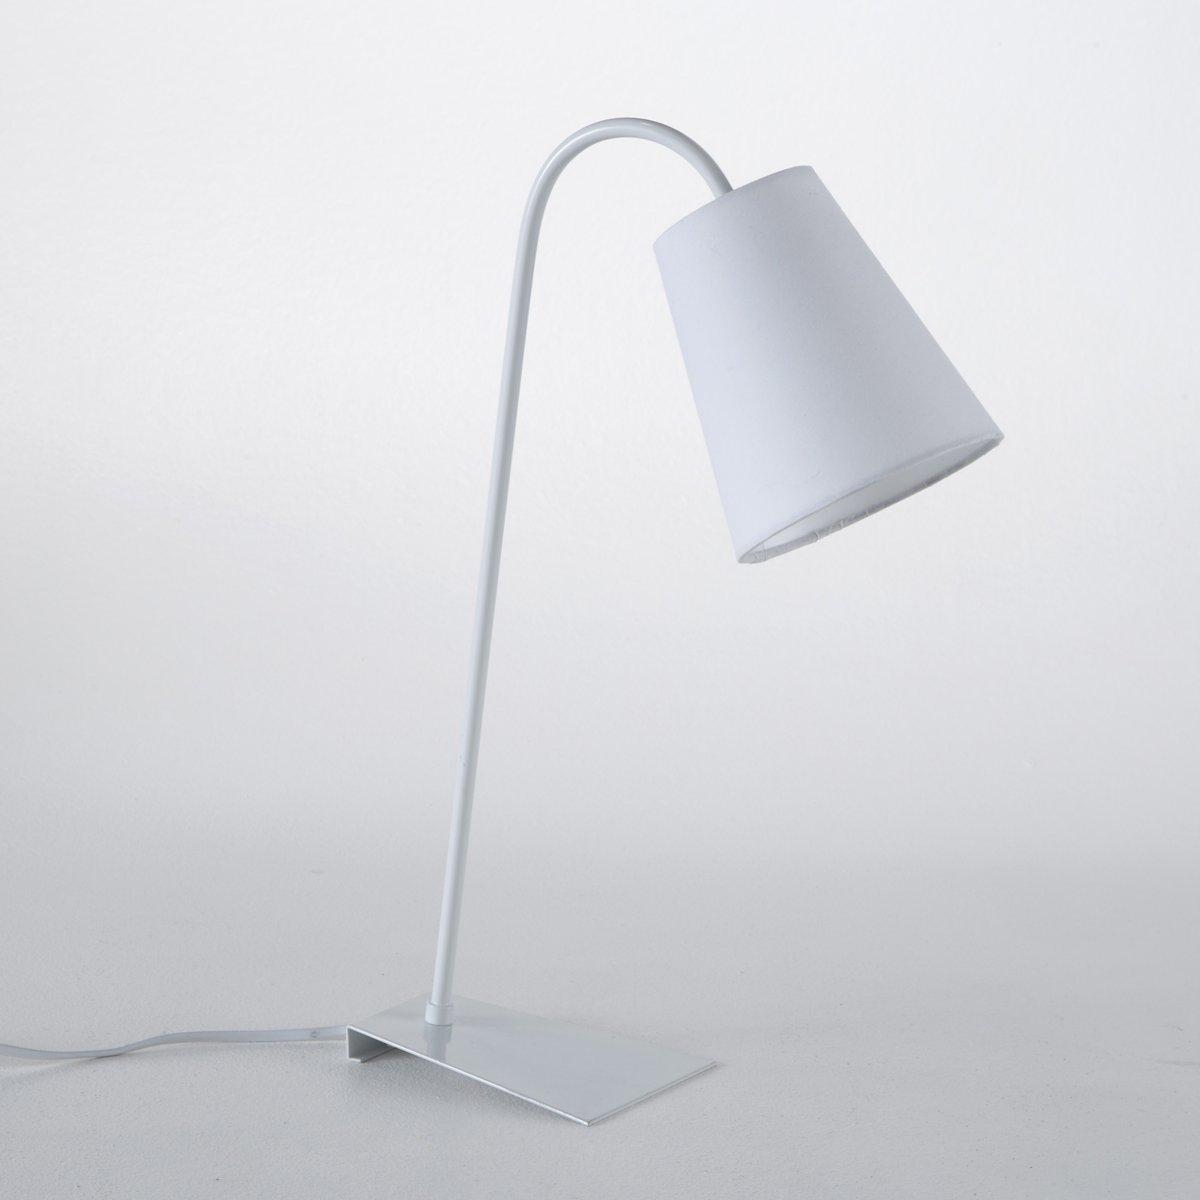 Лампа настольная из металла, Pactus лампа для чтения 1 x 401410 12smd 31 36 39 41